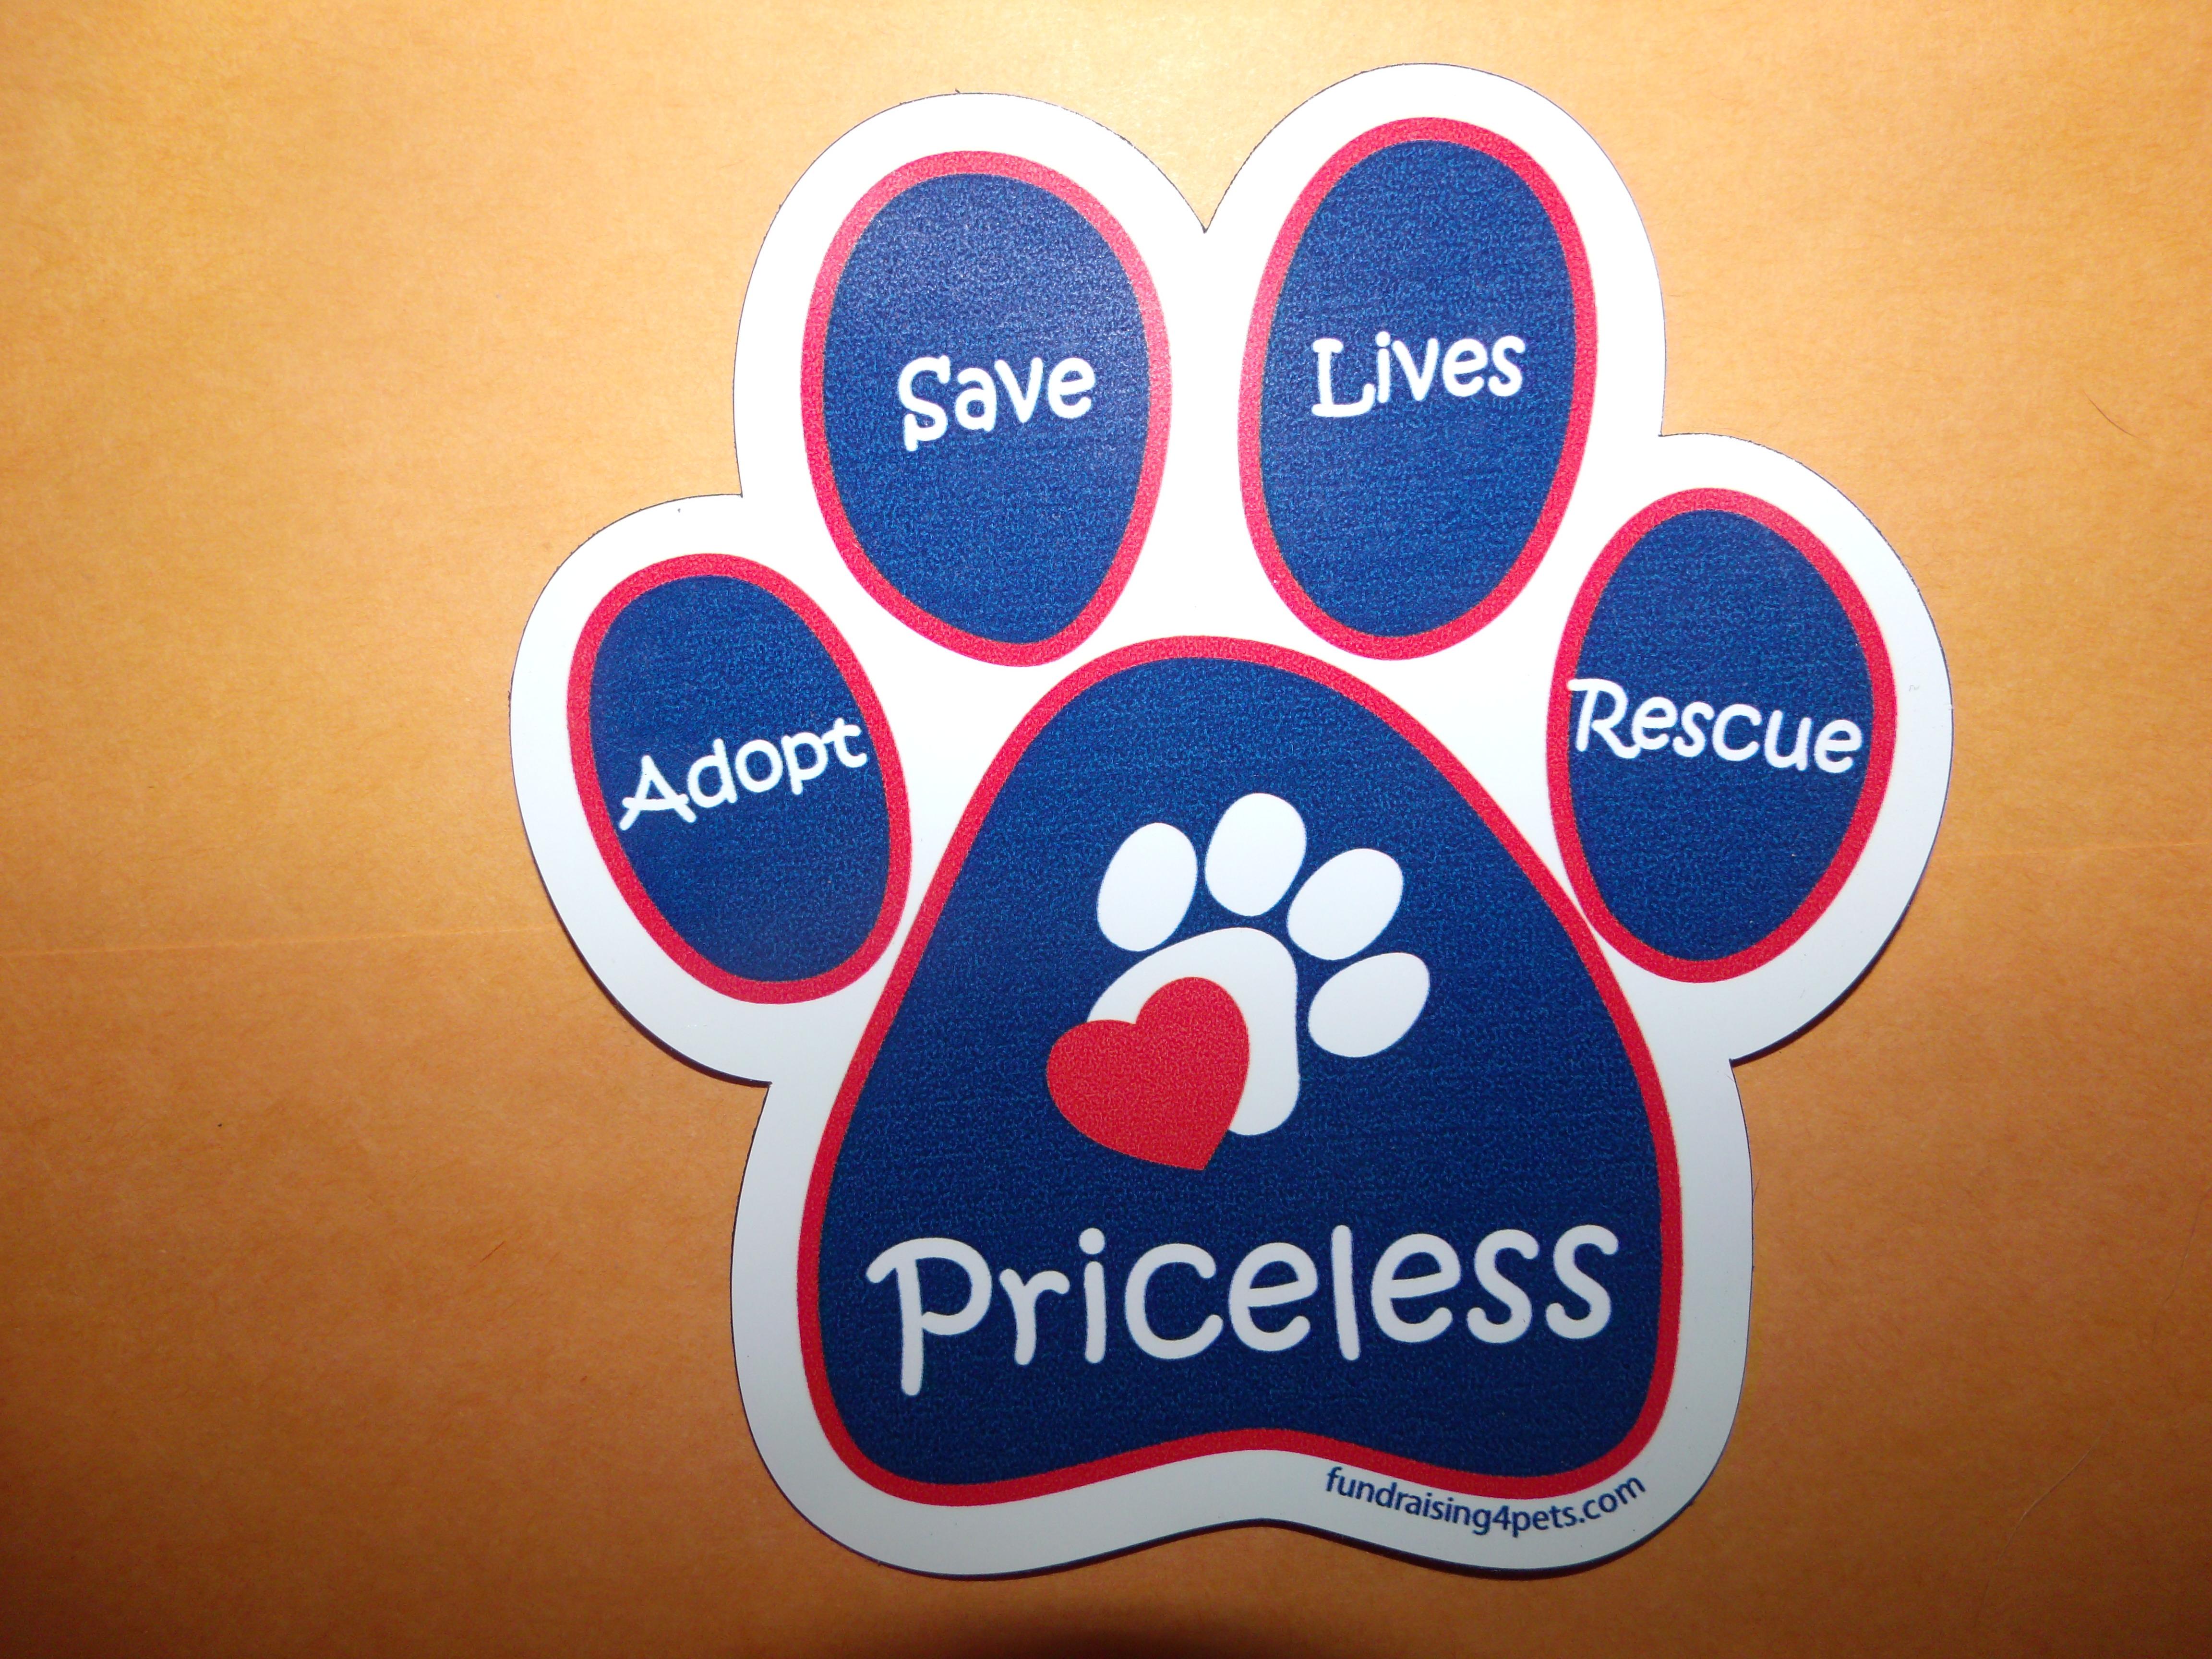 Adopt, Priceless...